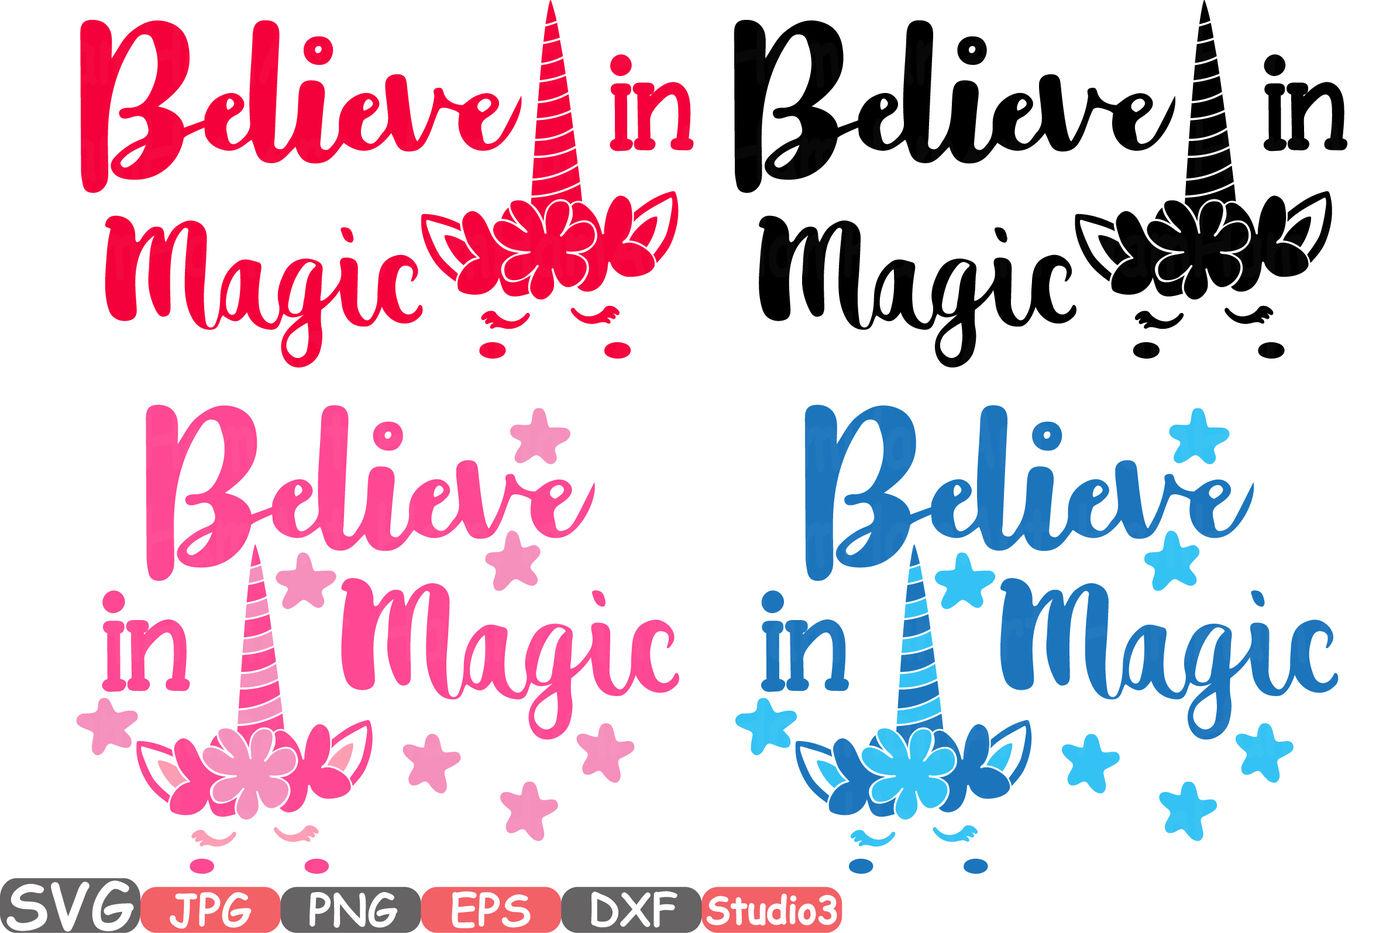 Believe In Magic Flower Unicorn Silhouette Svg Cutting Files Digital Clip Art Graphic Studio3 Cricut Cuttable Die Cut Machines 55sv By Hamhamart Thehungryjpeg Com